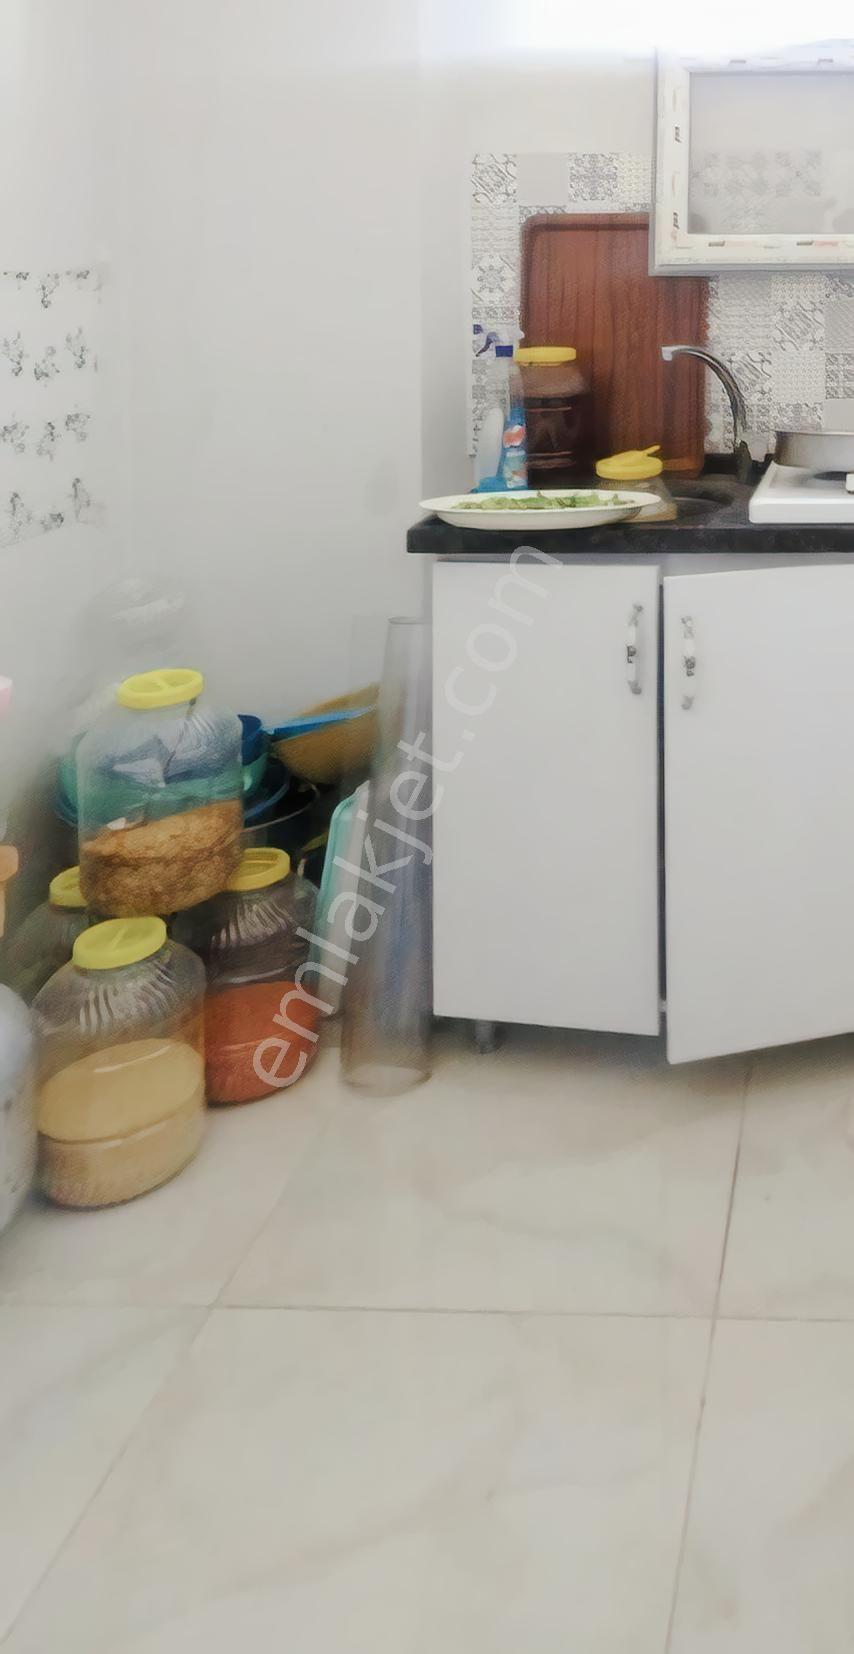 https://imaj.emlakjet.com/oda/watermarked-image/test/2021-7-26/edited-9604951/243642245-edited.jpg